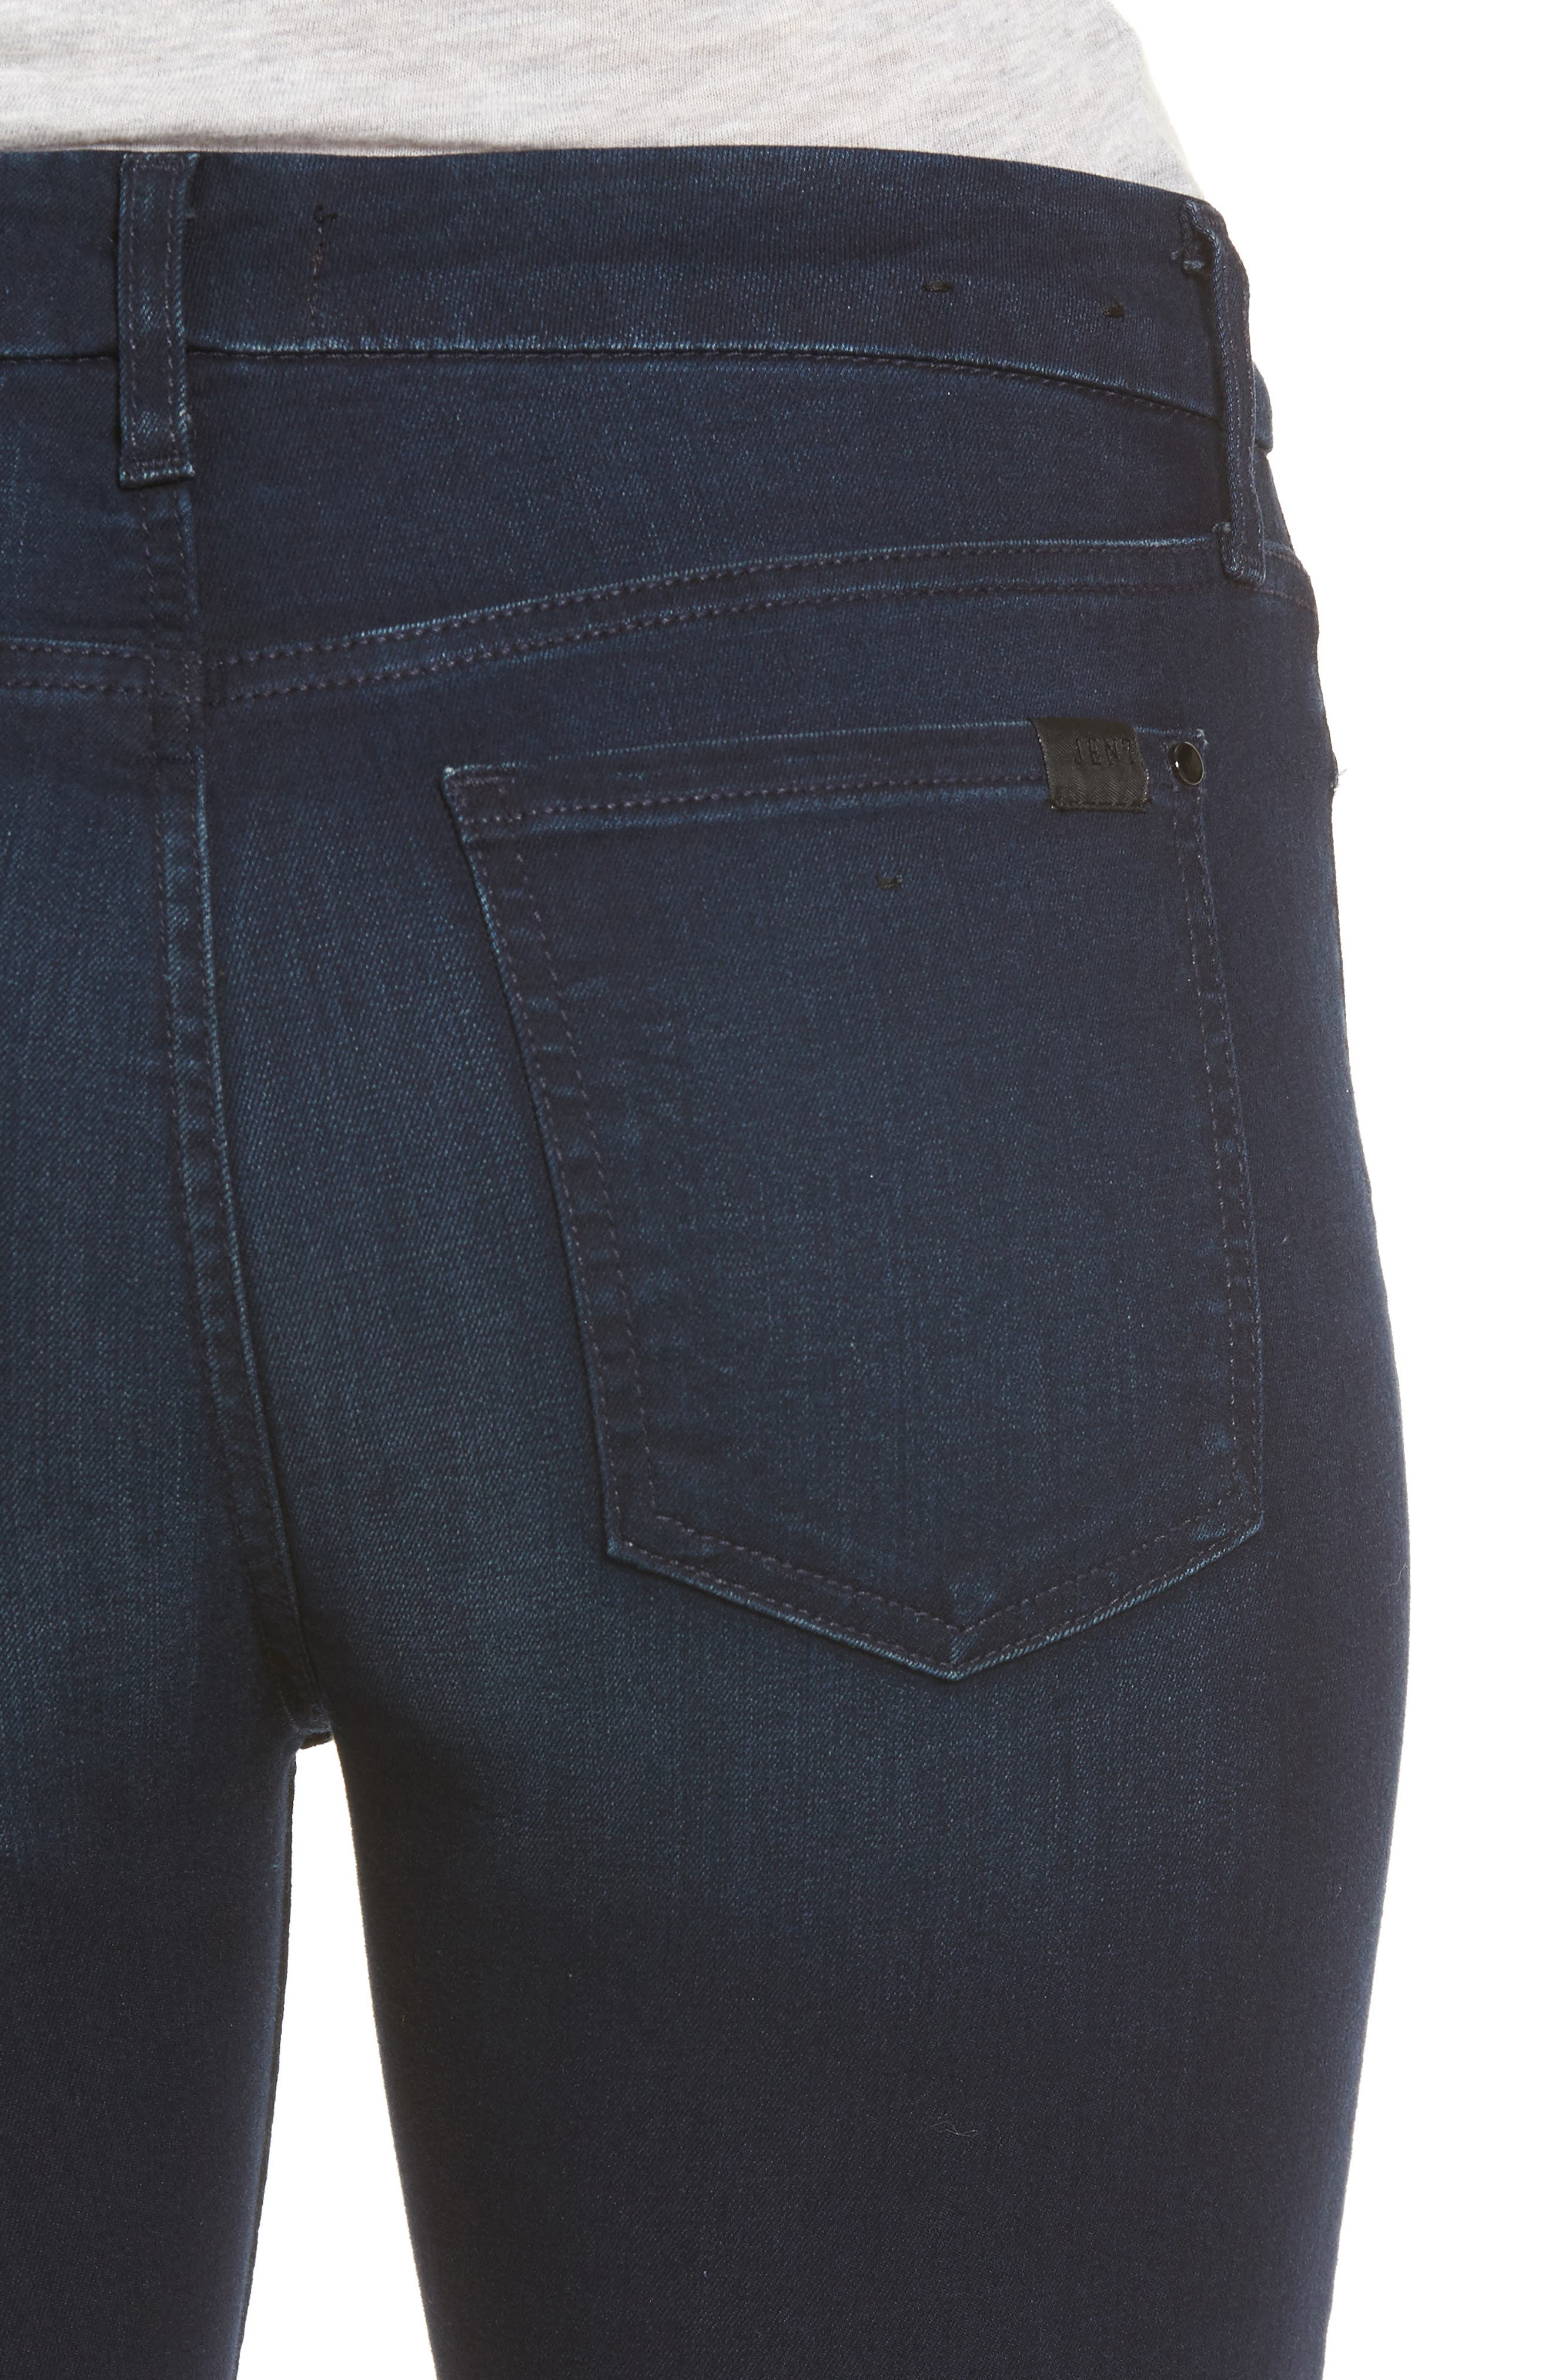 Slim Straight Jeans,                             Alternate thumbnail 4, color,                             Riche Touch Blue/ Black